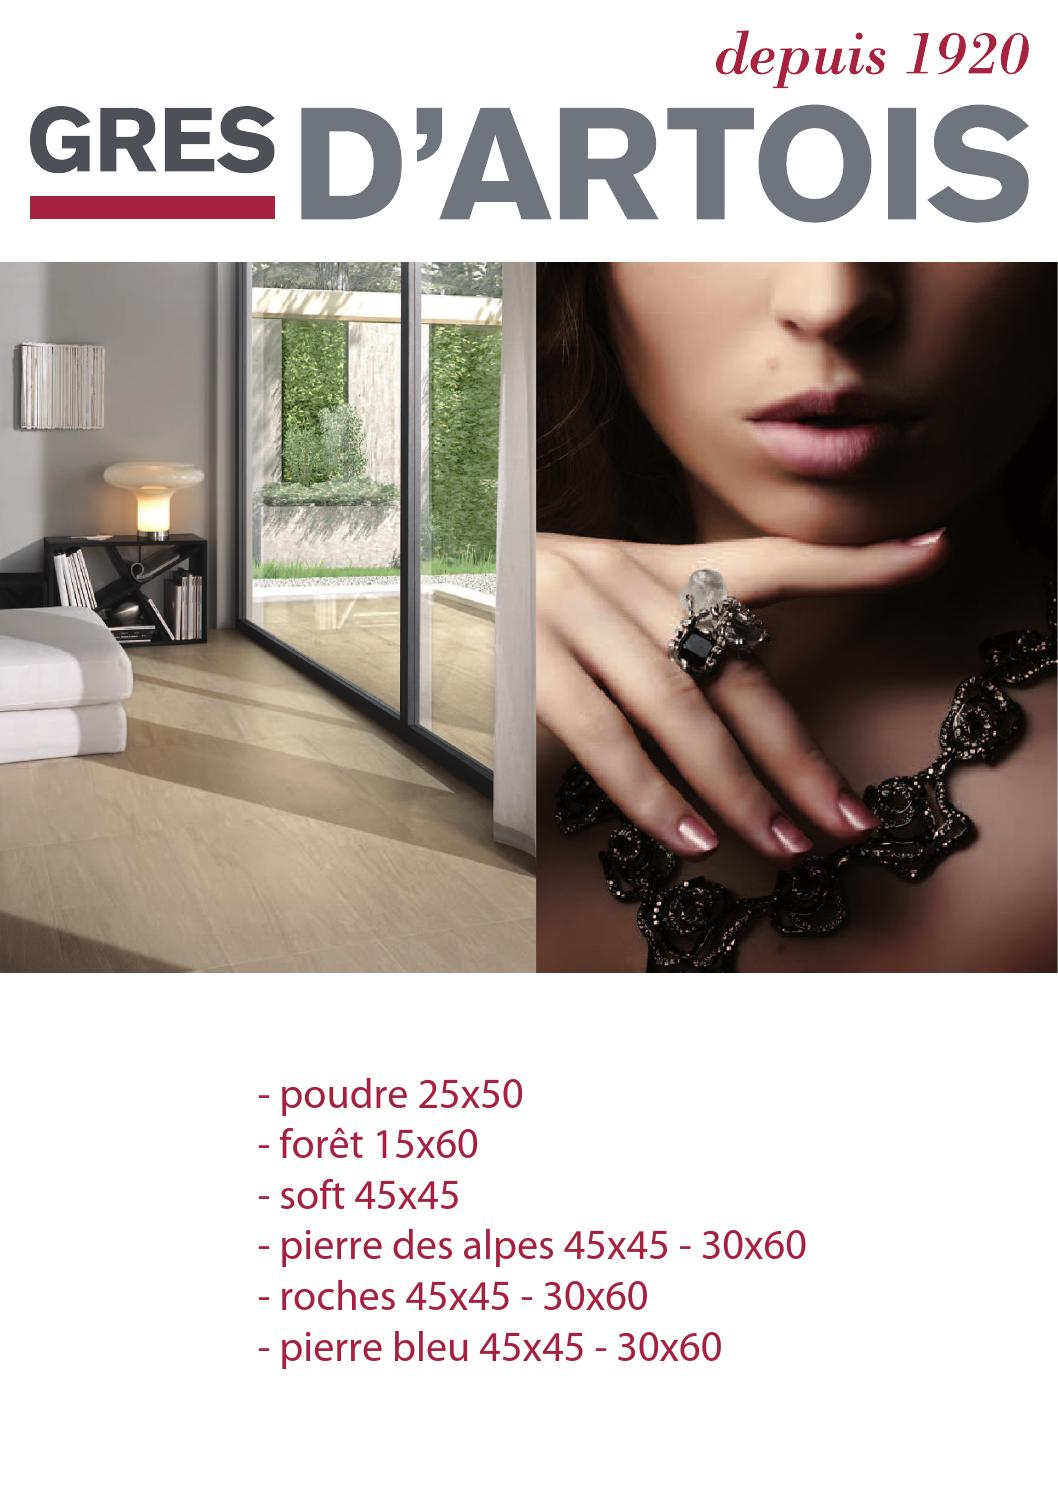 Catalogue Gres D'Artois 2012/2013 by AREA FRANCERAM - Issuu